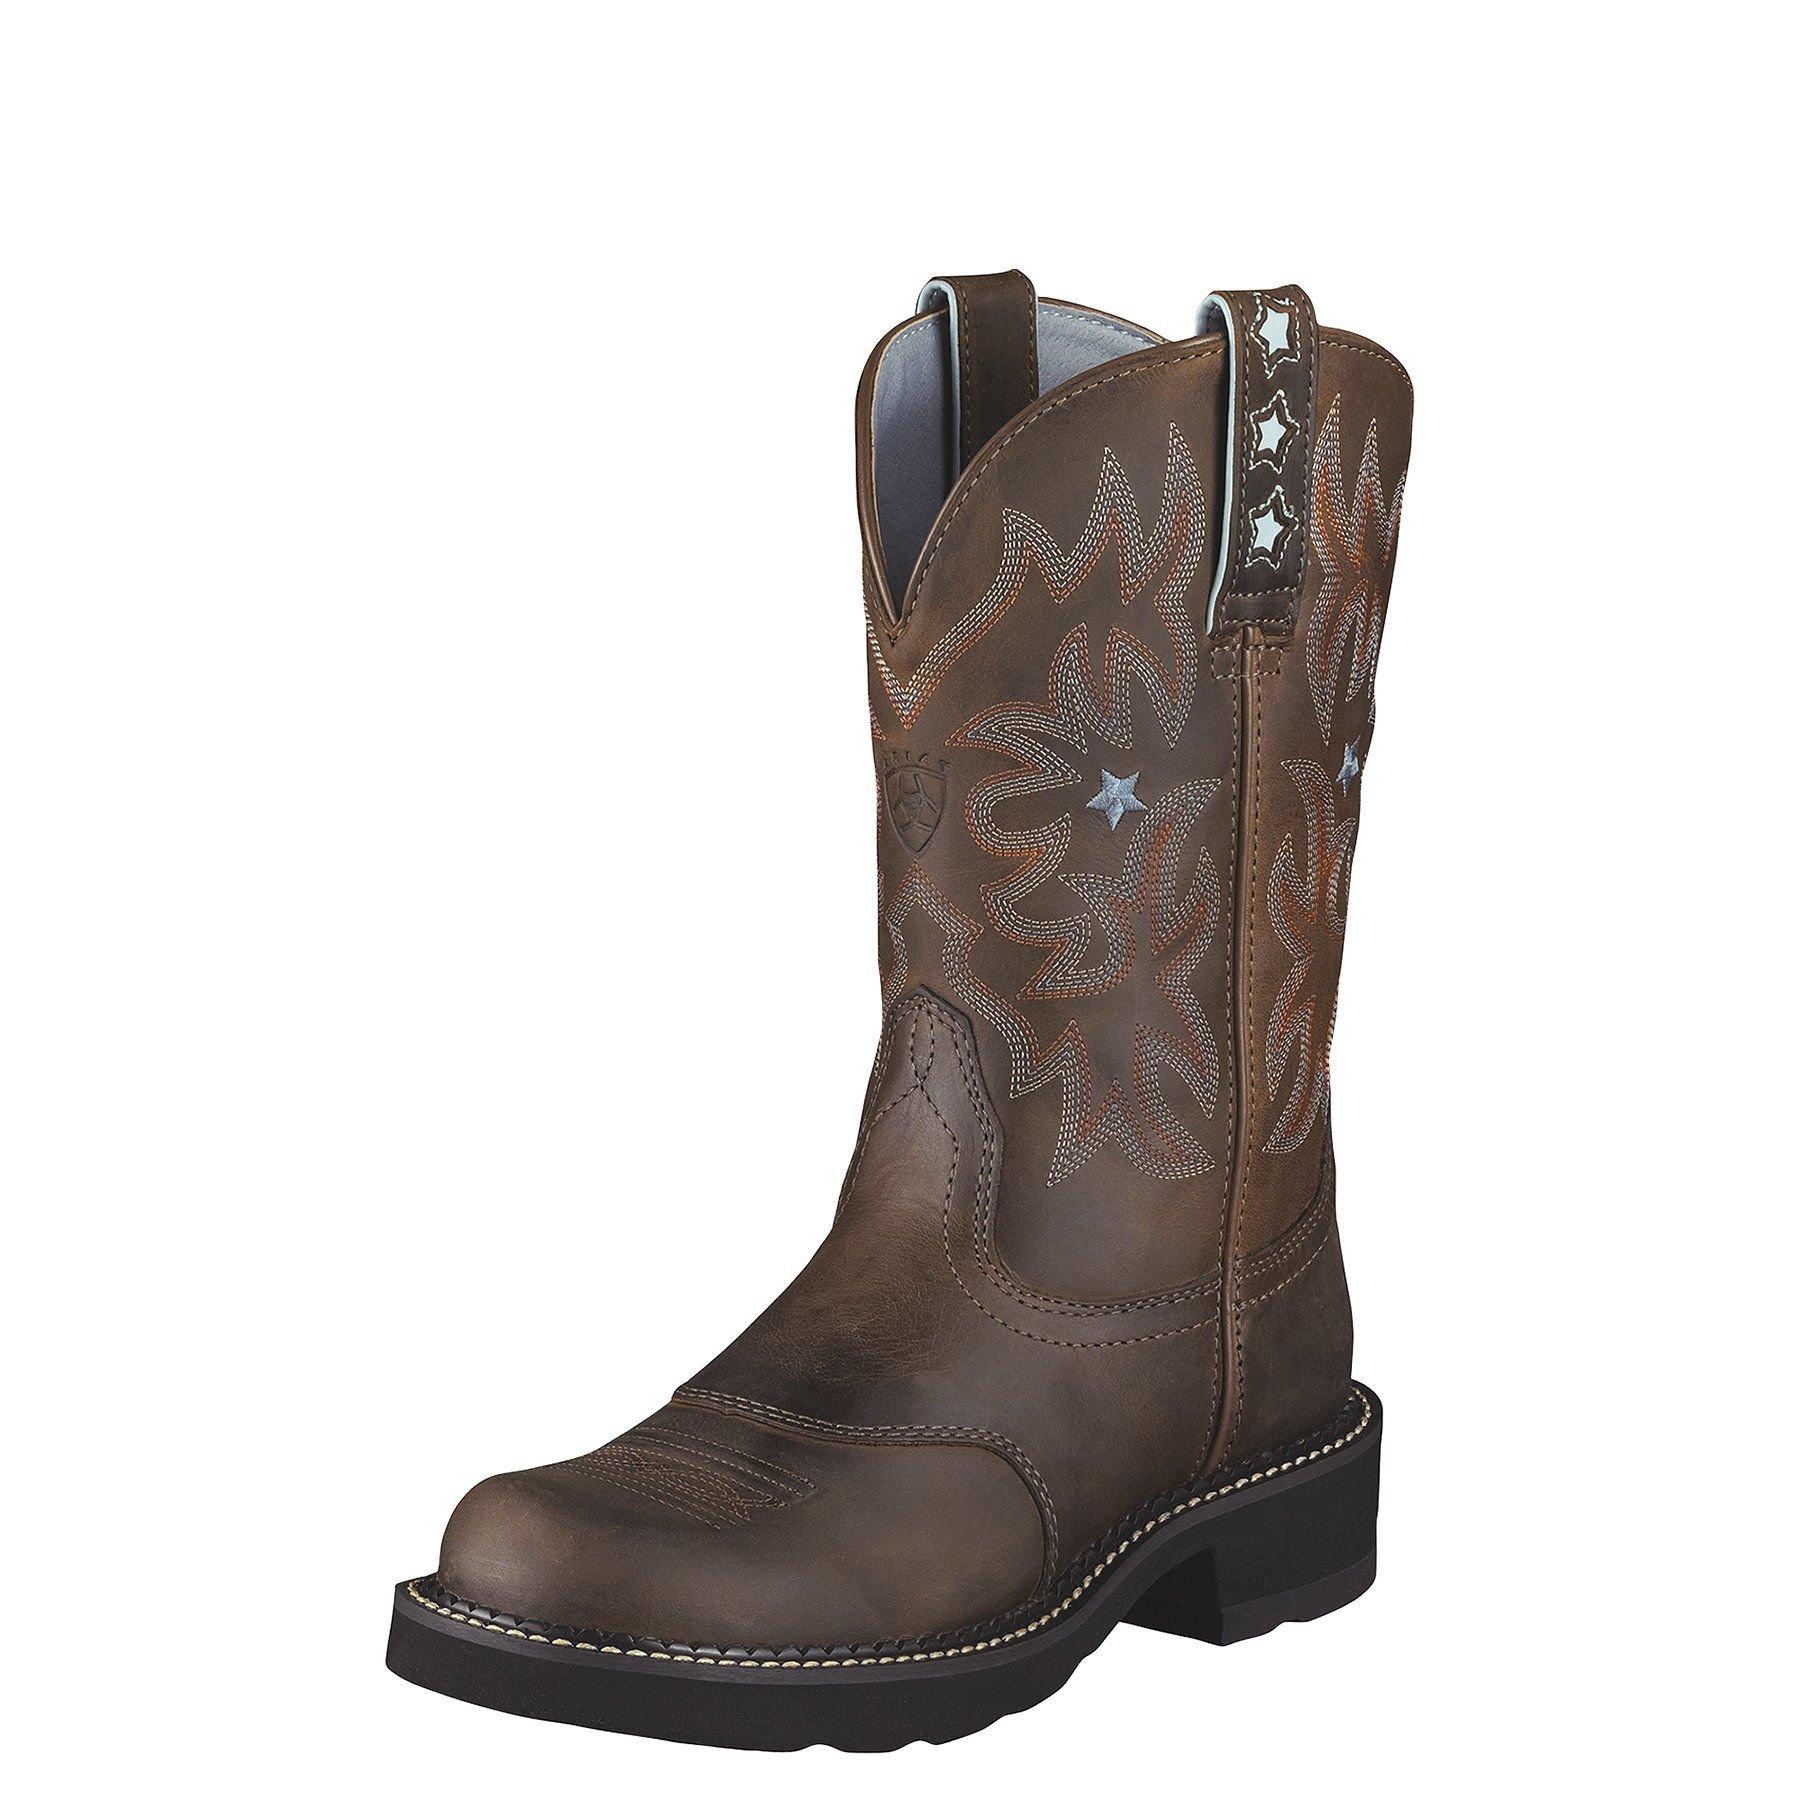 Ariat Women's Probaby Western Cowboy Boot, Driftwood Brown, 6.5 C US